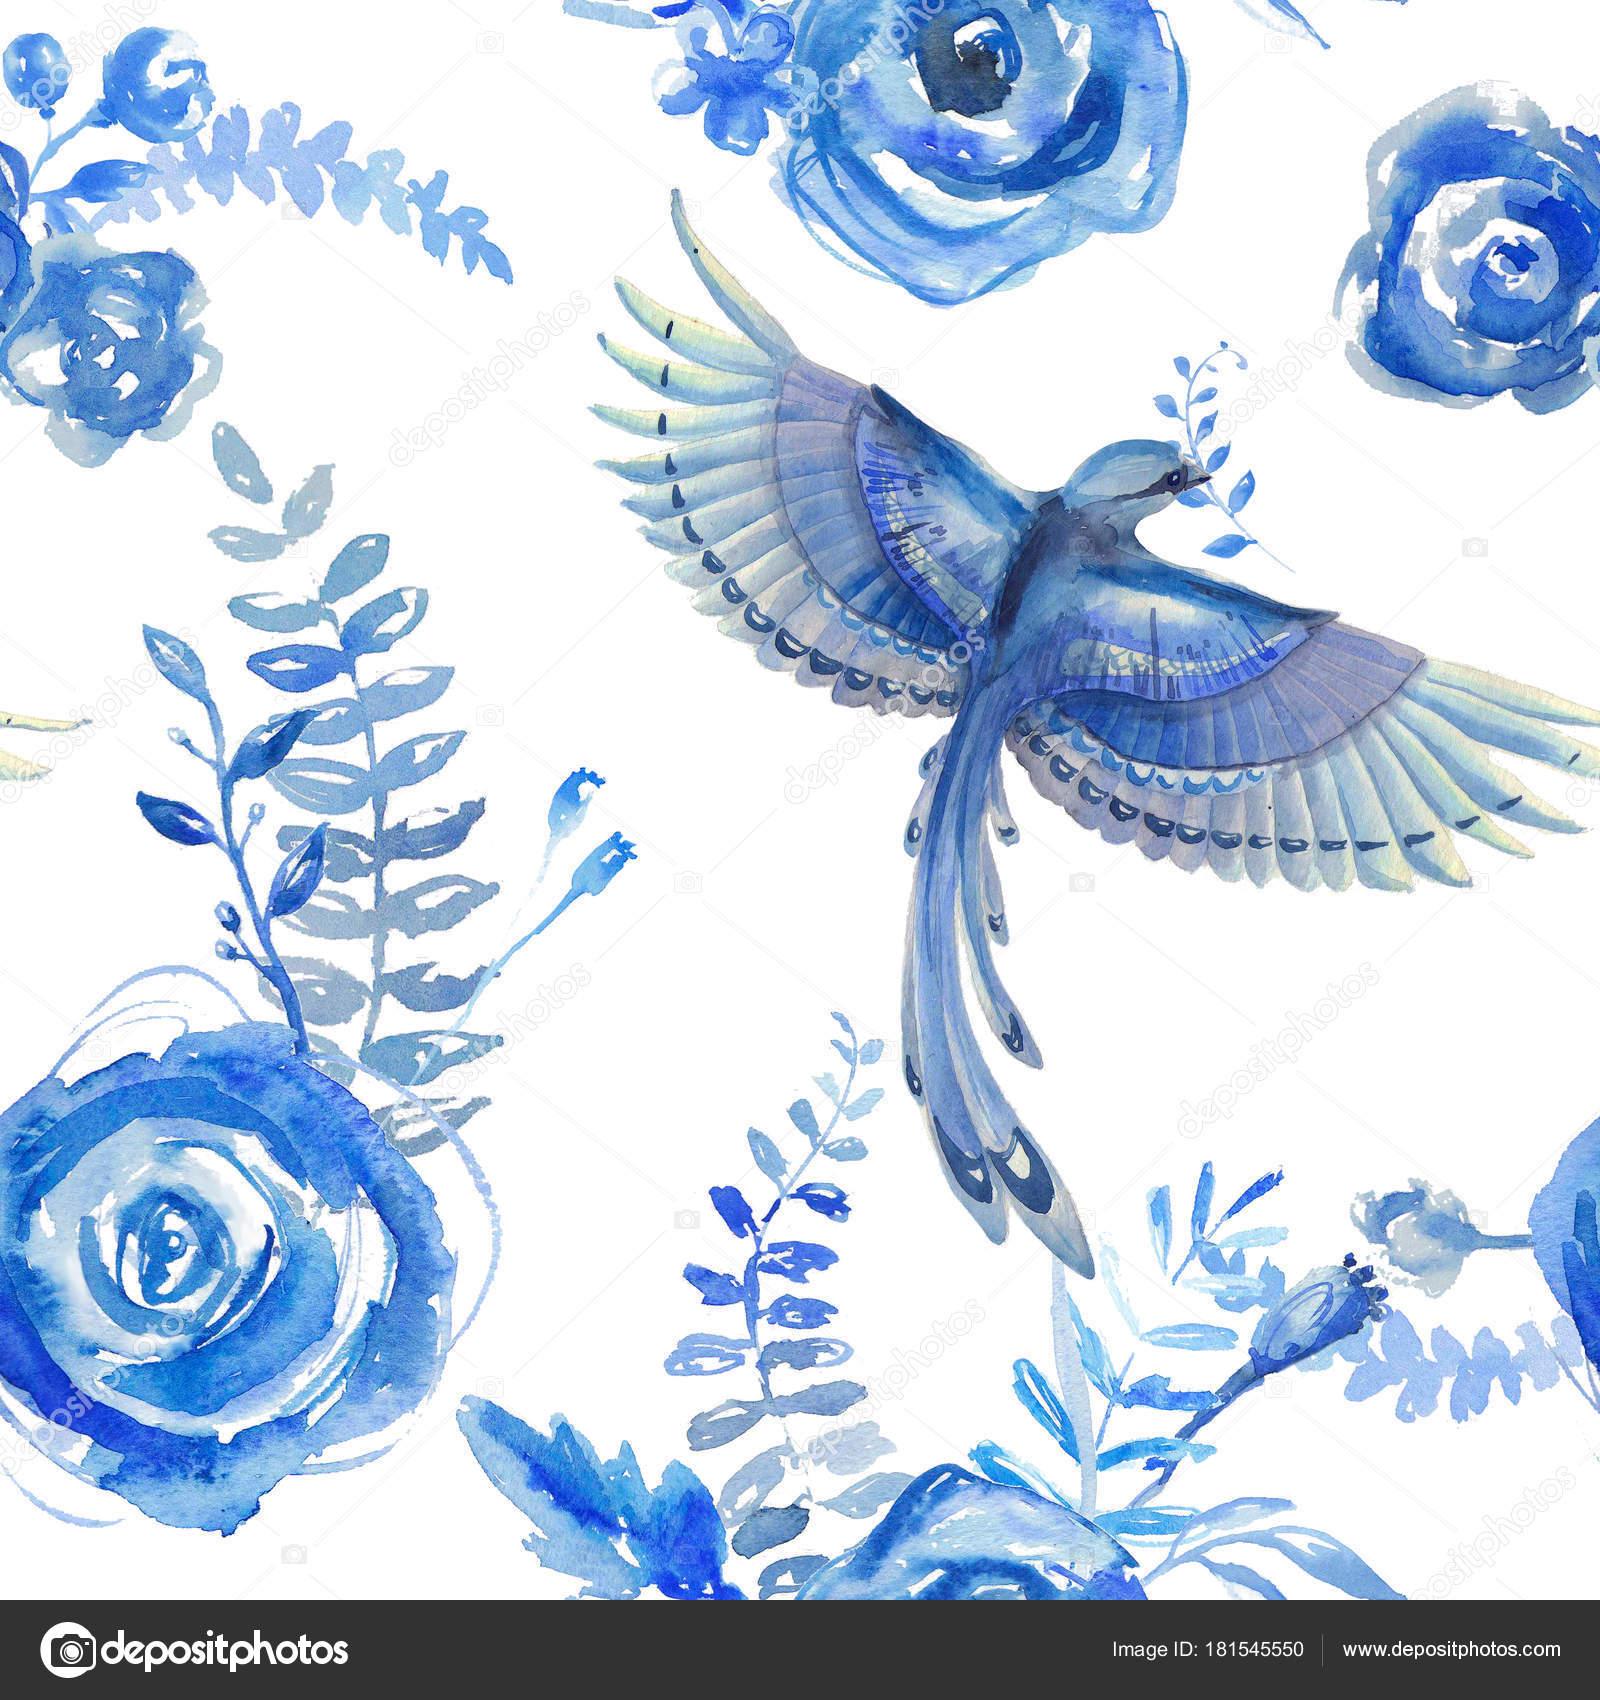 Floral Watercolor Pattern Texture Flowers Birds Blue Floral Pattern